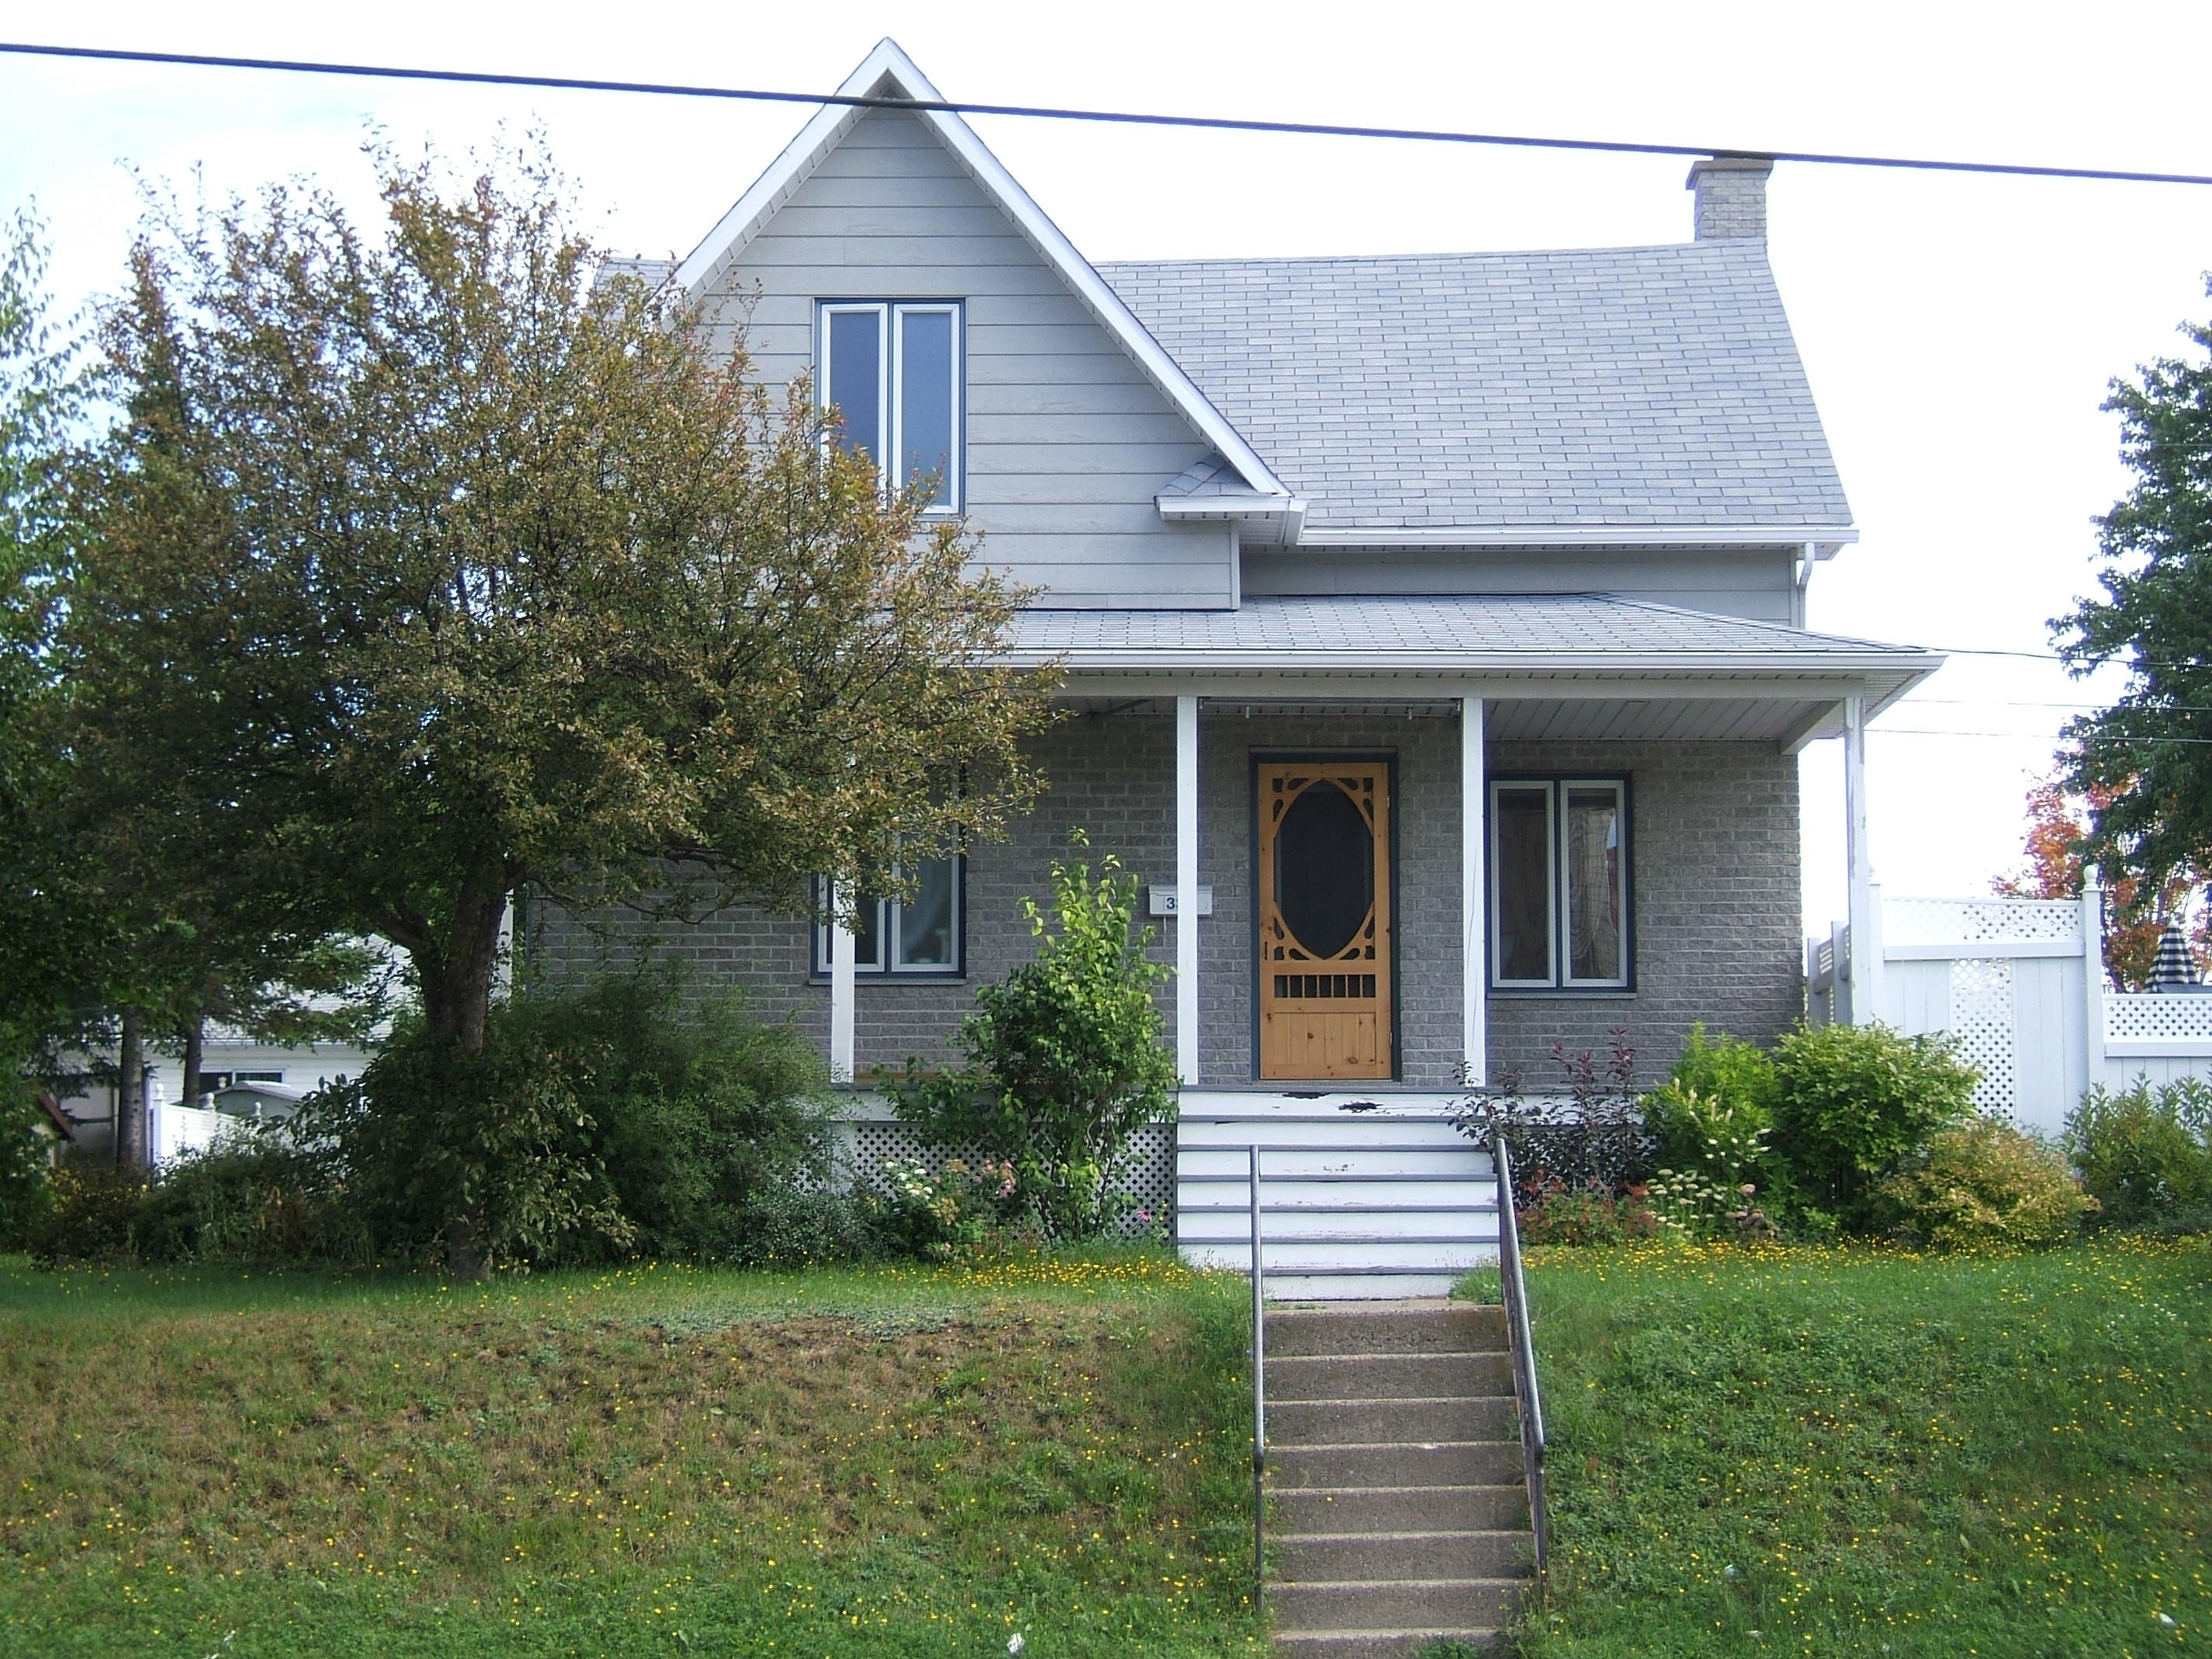 1200 - 332, avenue Rouleau